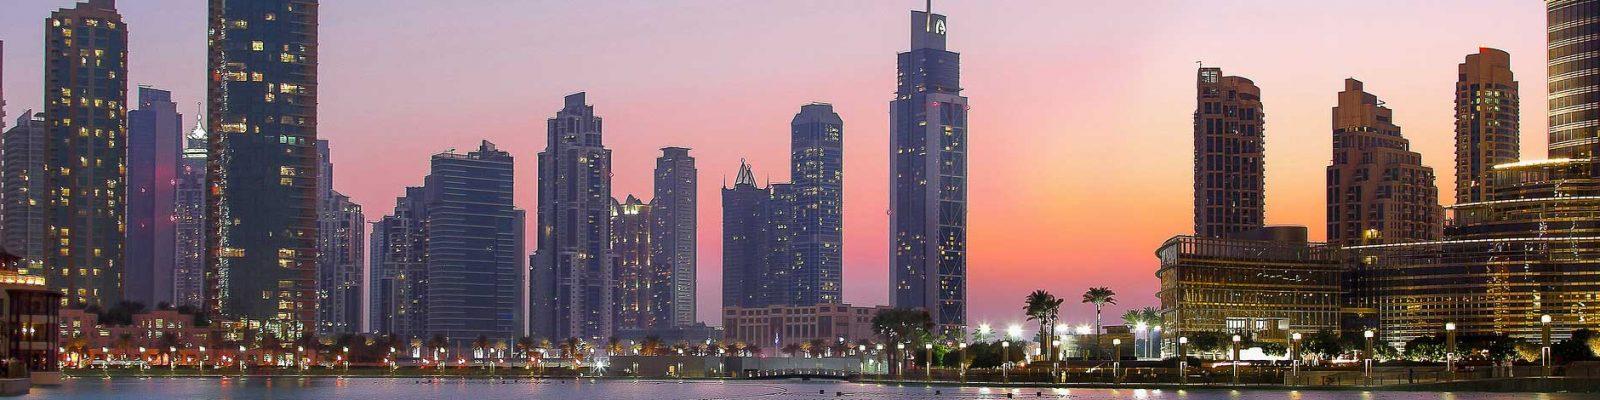 Windows Doors and Facades Dubai 2016, immagine di copertina